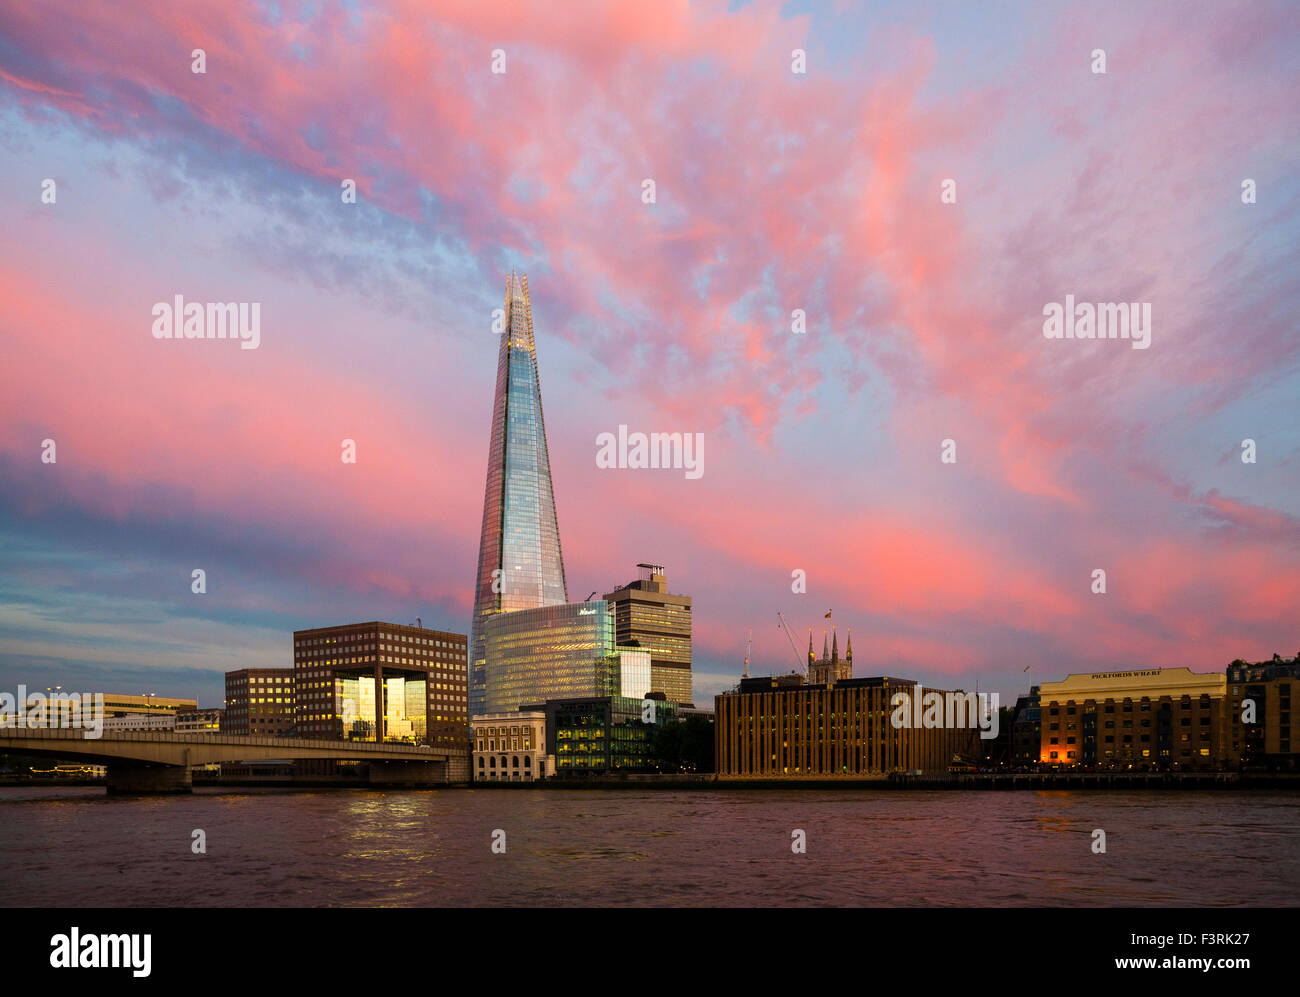 El Shard, Southwark, Londres, Reino Unido. Imagen De Stock